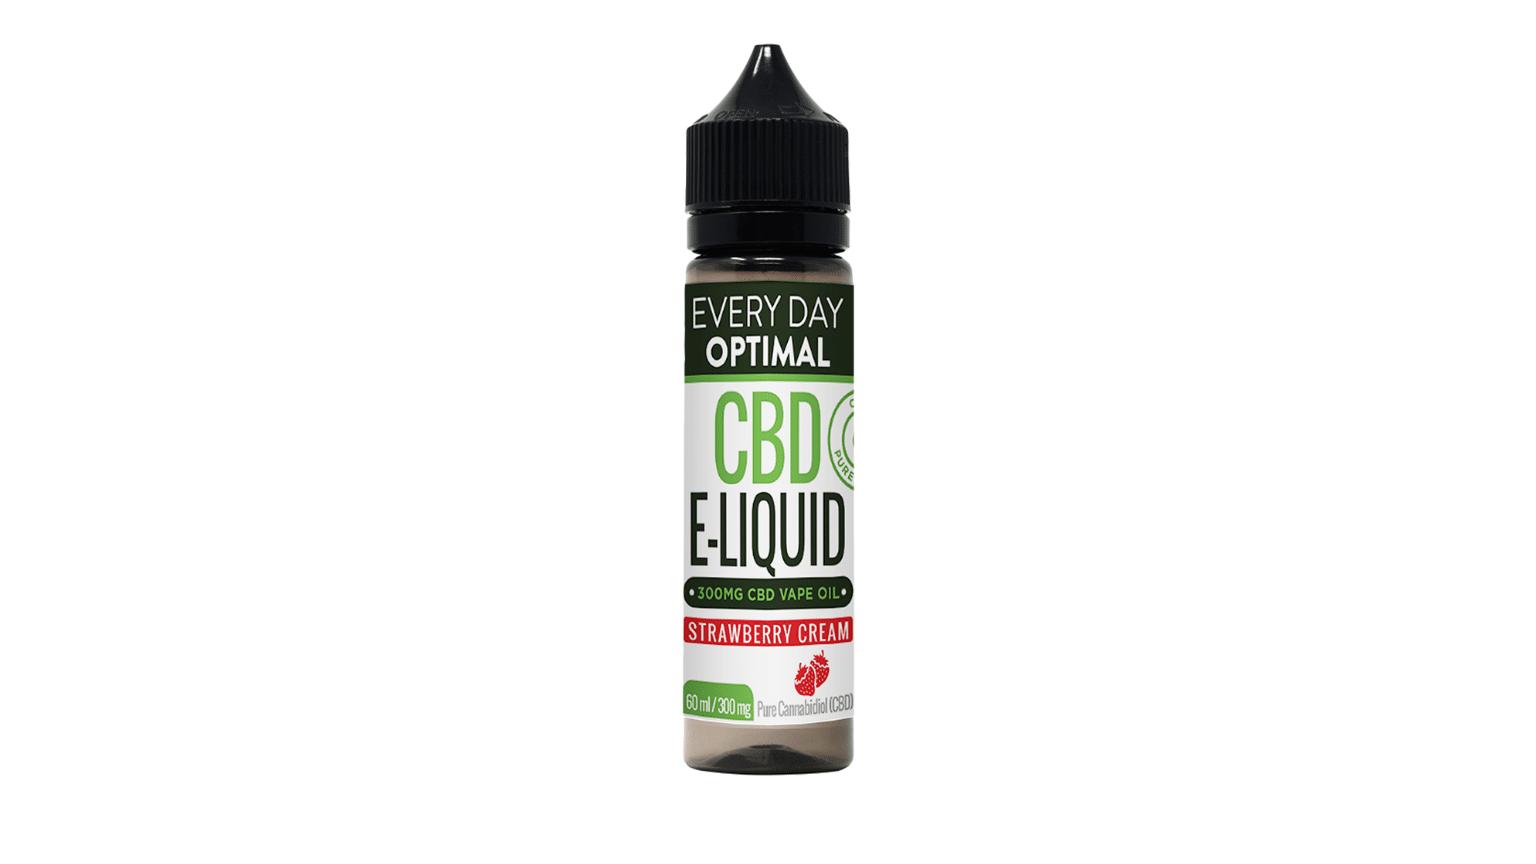 every-day-optimal-cbd-e-liquid